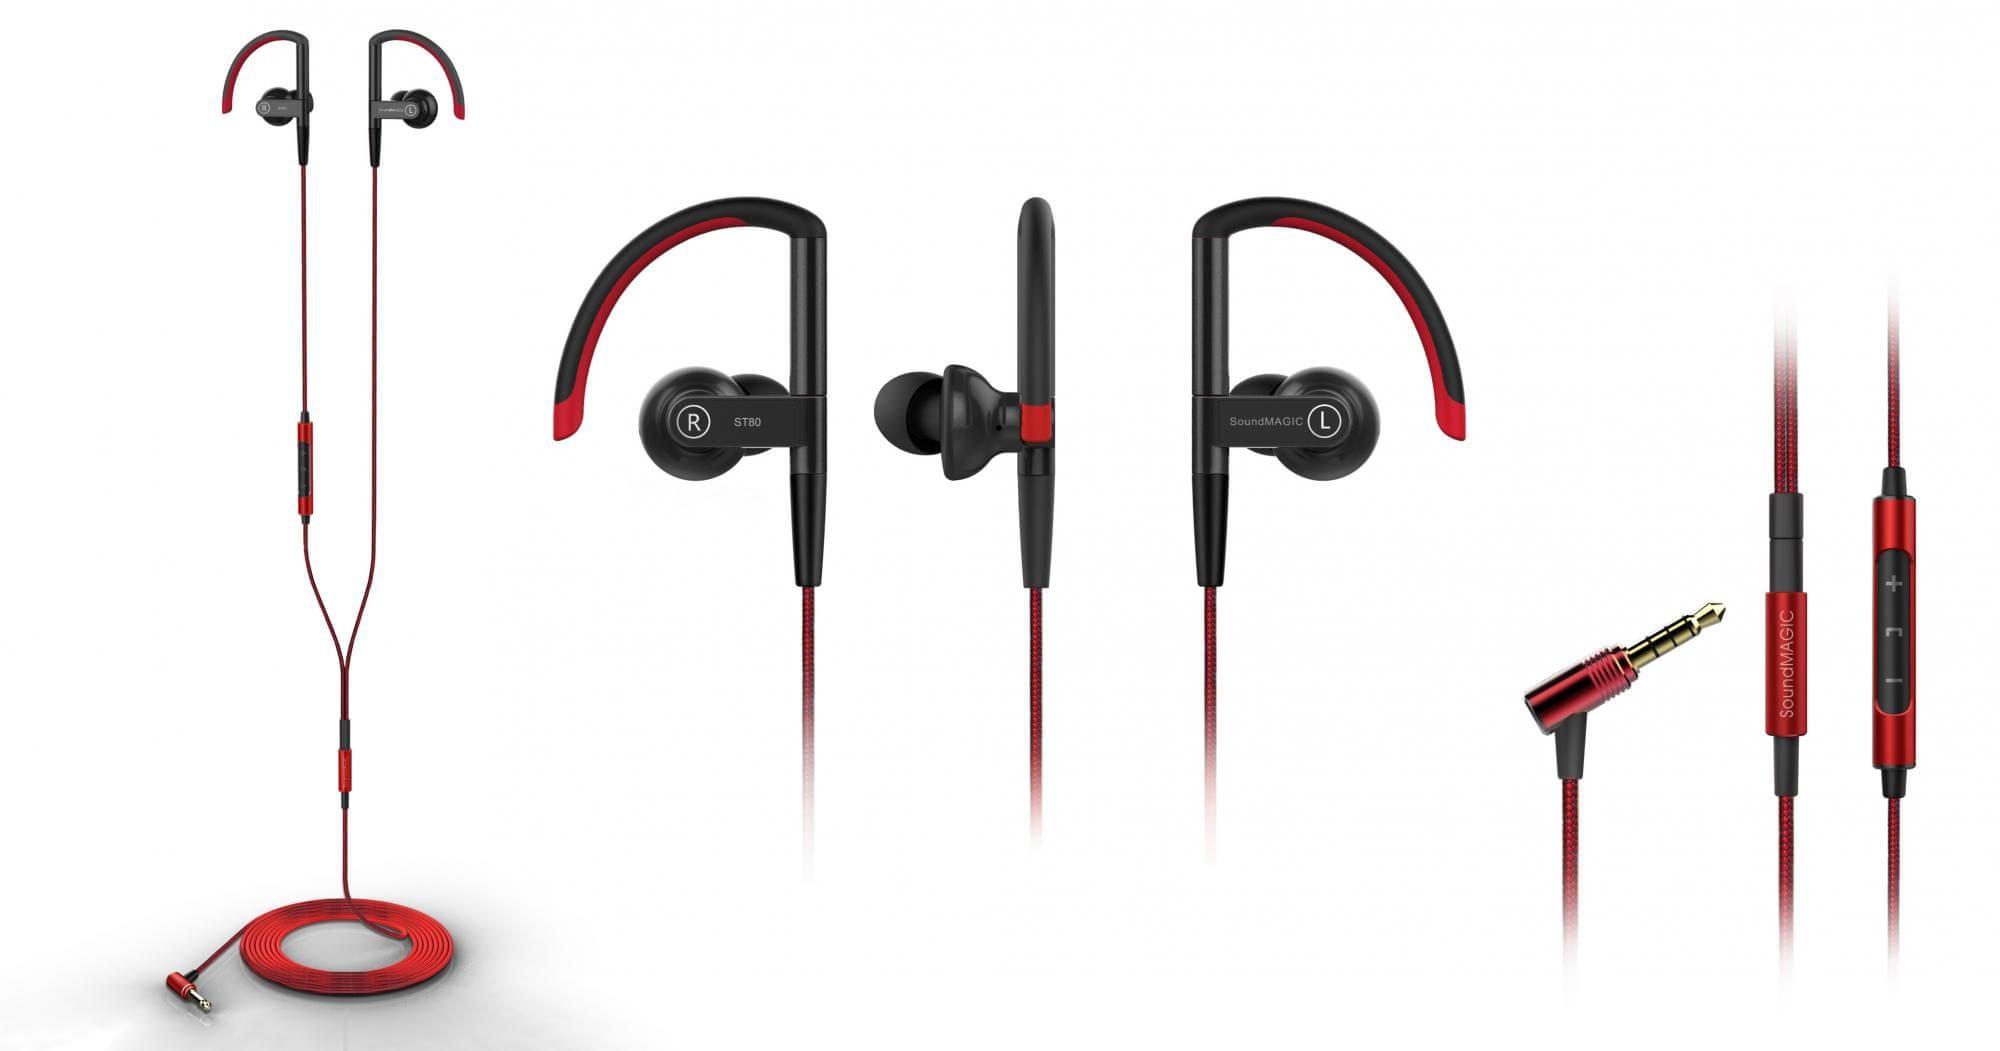 Sluchátka SoundMAGIC ST80 odolné proti vlhku a potu výdrž baterie 8h špuntová sluchátka